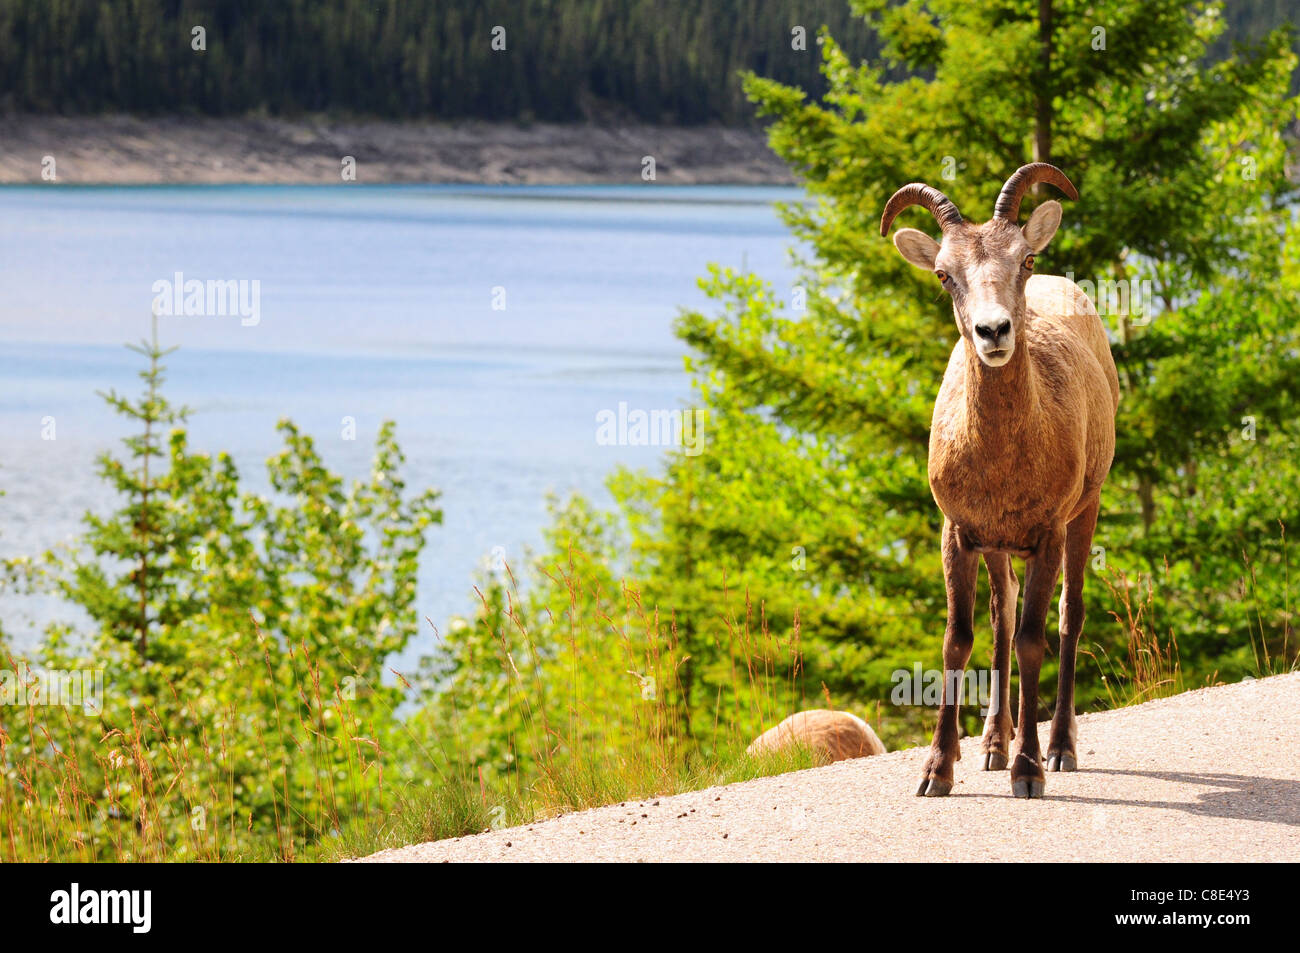 Big horn sheep on the road near Medicin lake in Jasper, Canada - Stock Image